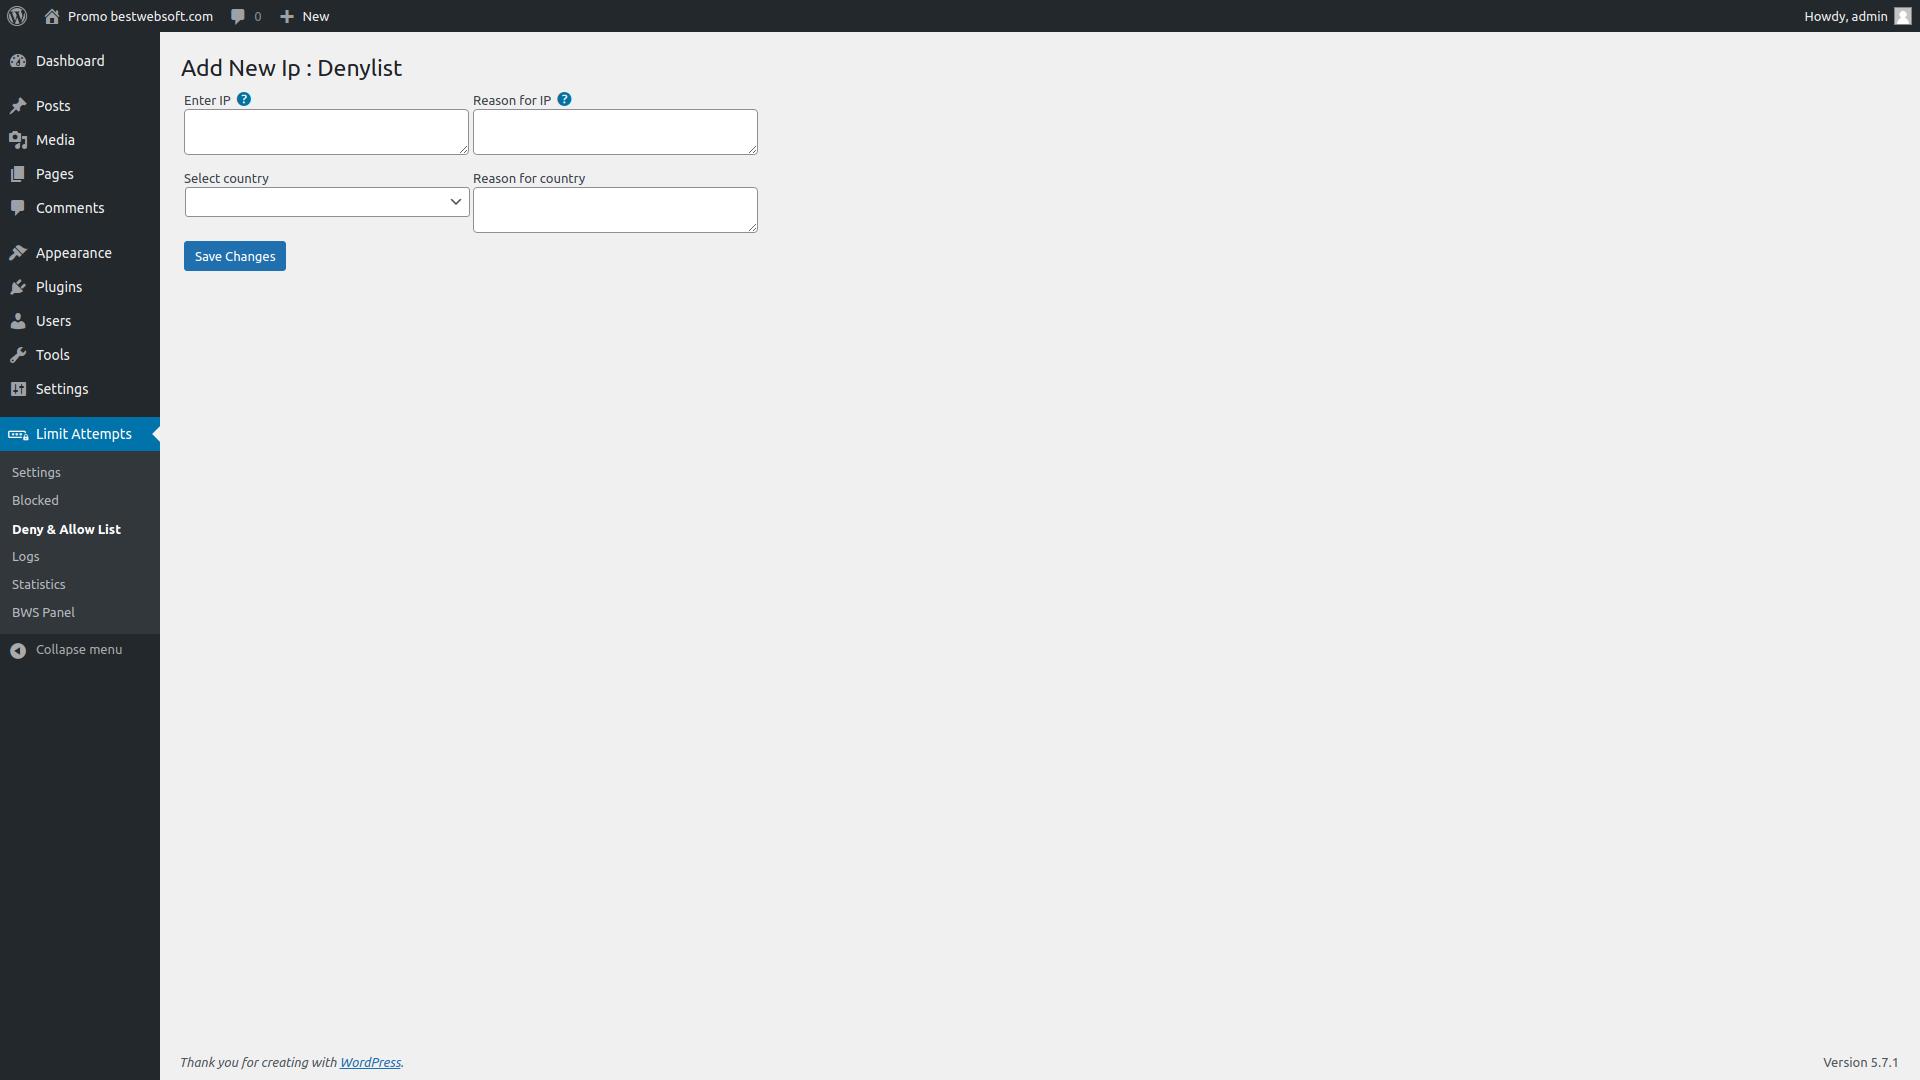 limit attempts screenshot 14